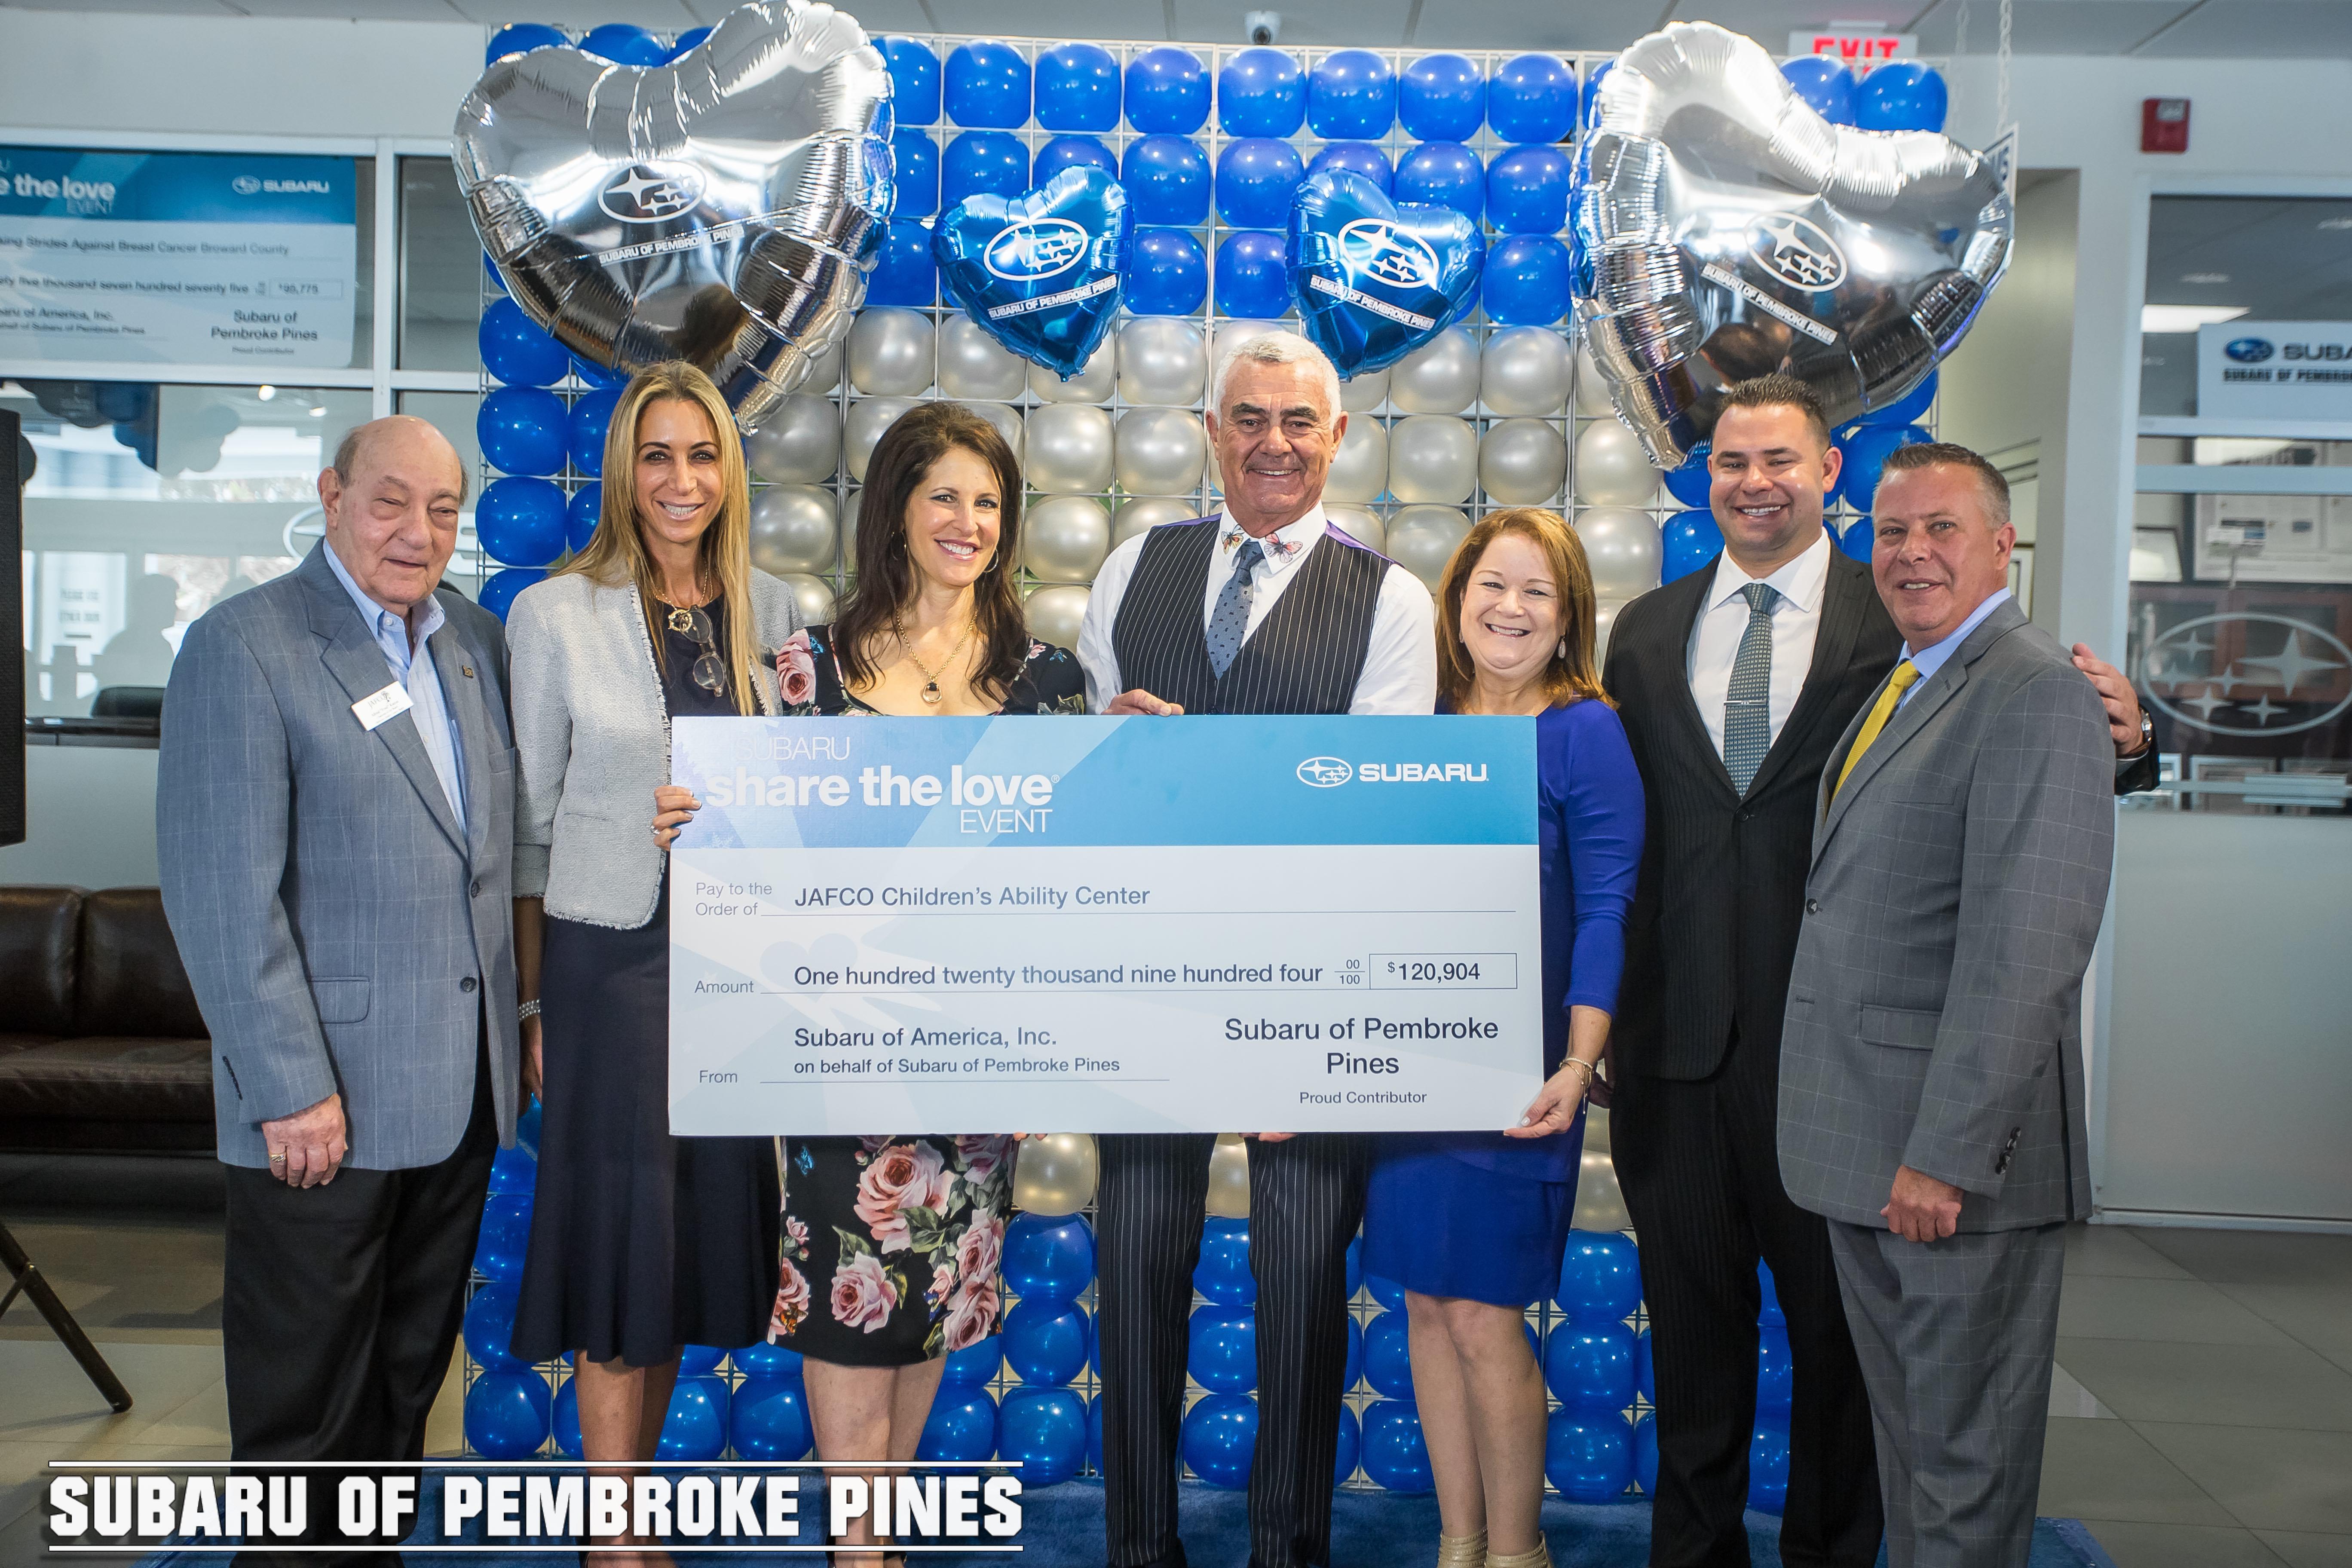 Subaru Of Pembroke Pines >> Subaru of Pembroke Pines and Craig and Martine Zinn Host